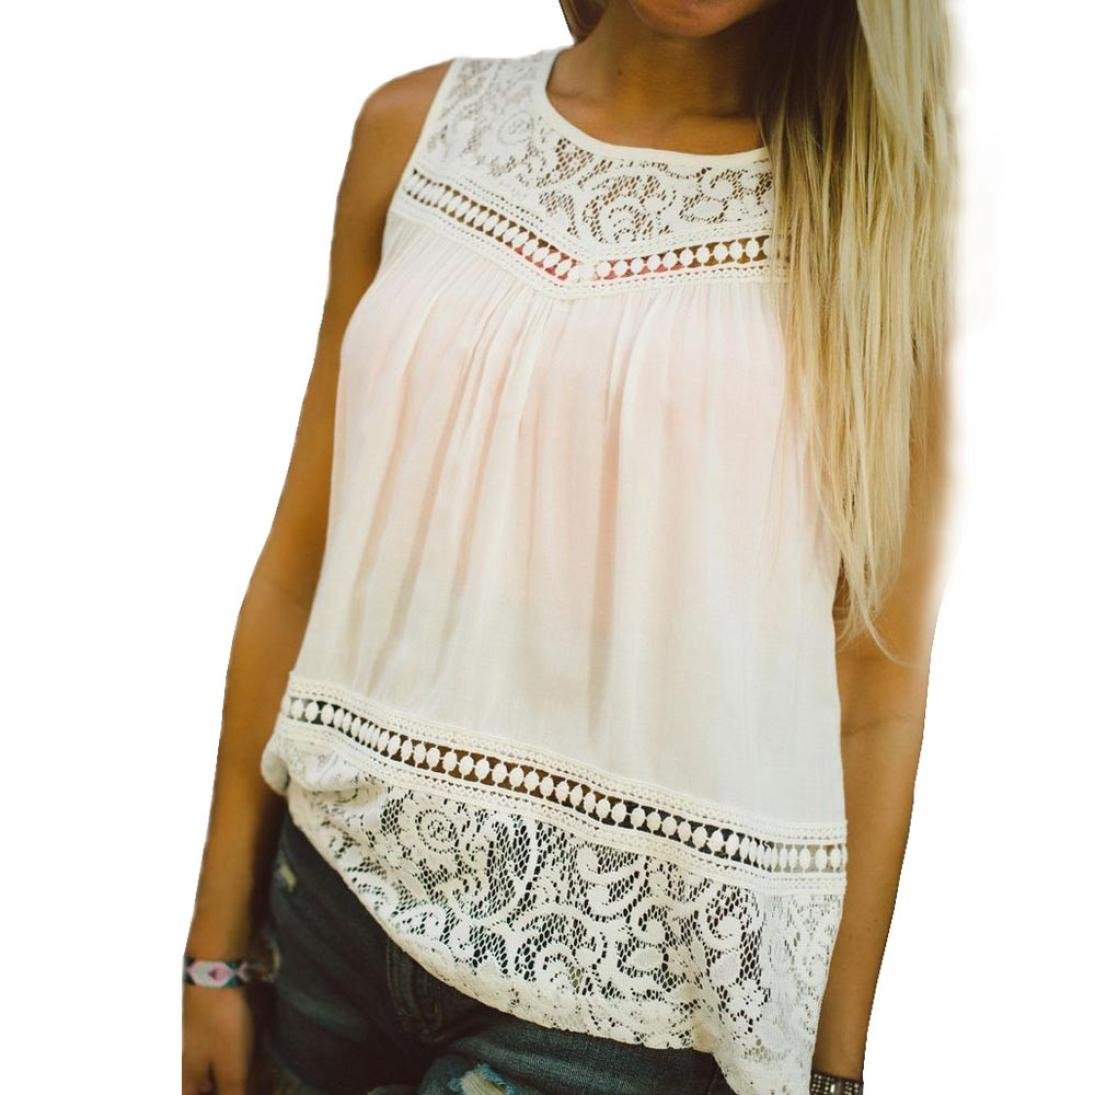 Tank Tops Women, ZYEE❤️ Women Summer Lace Splice Vest Tops Loose Sleeveless Blouse Tank Tops Casual Chiffon T-Shirt Sleeveless Shirt Dress (L, White)